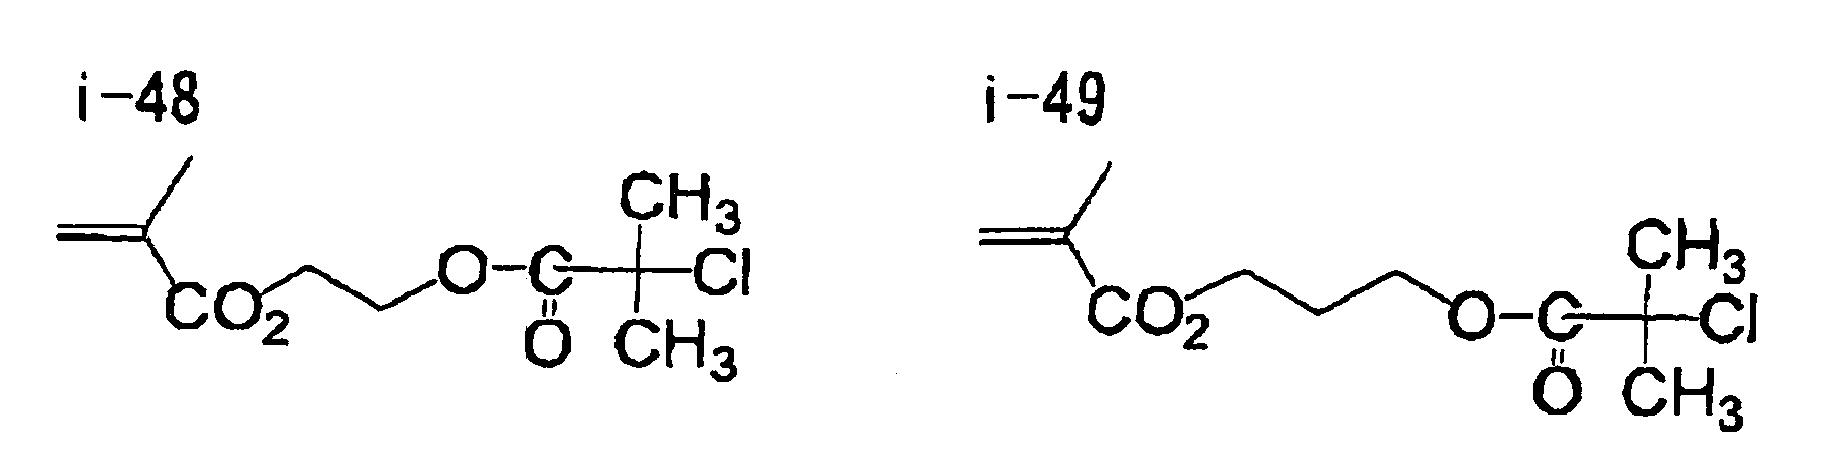 Figure imgb0063